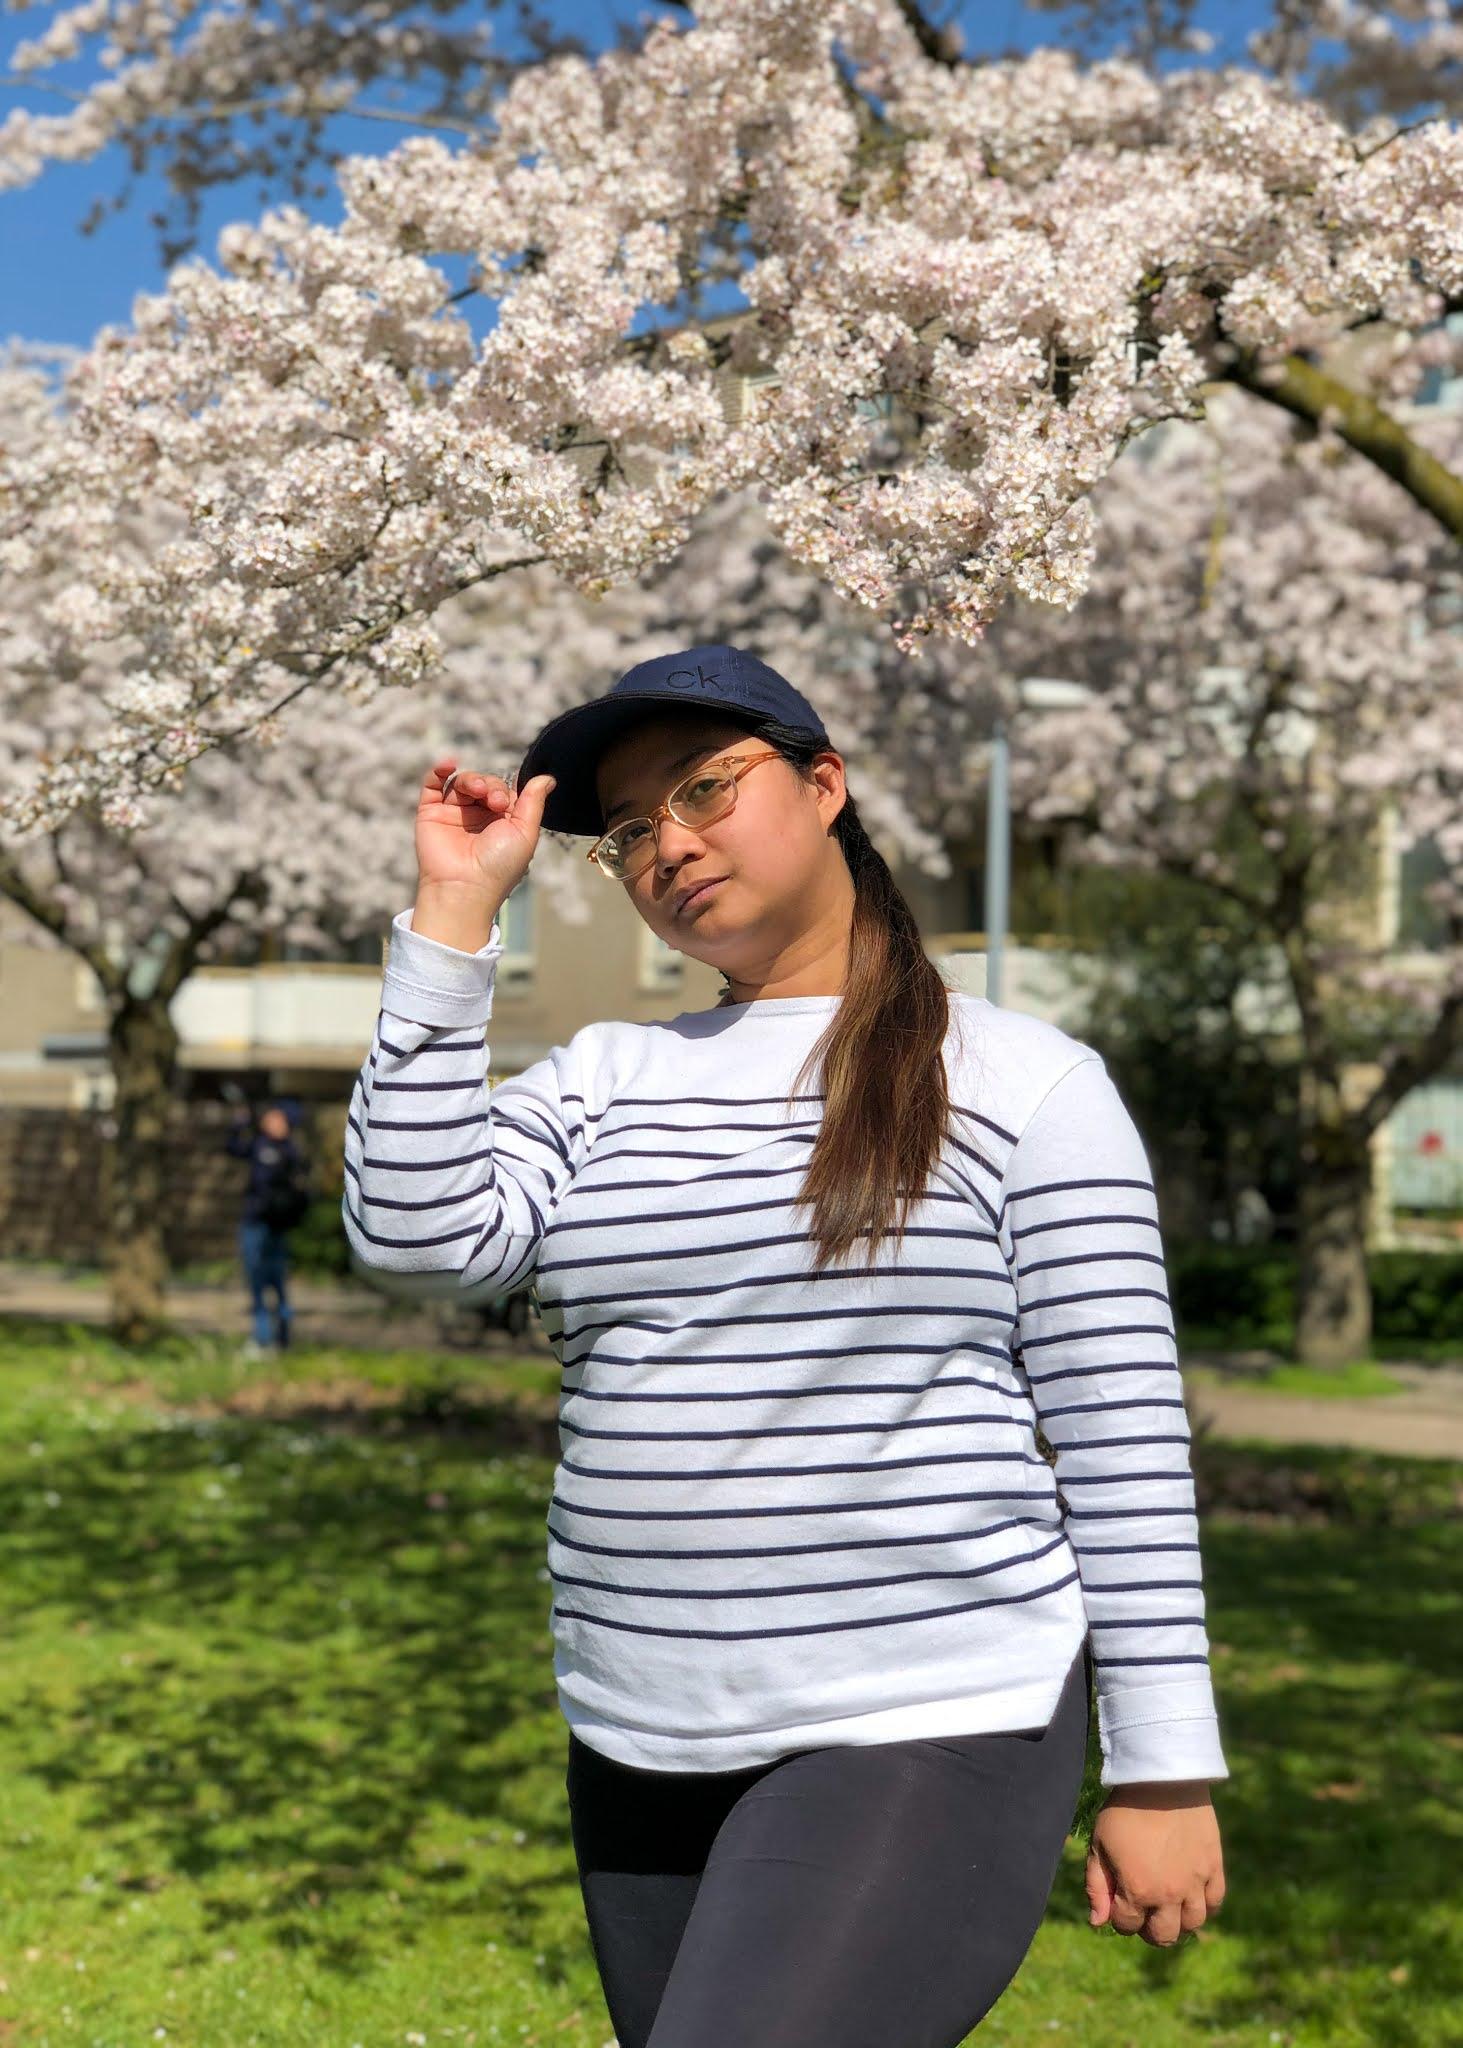 Be Carol Sakura Cherry Blossoms Netherlands